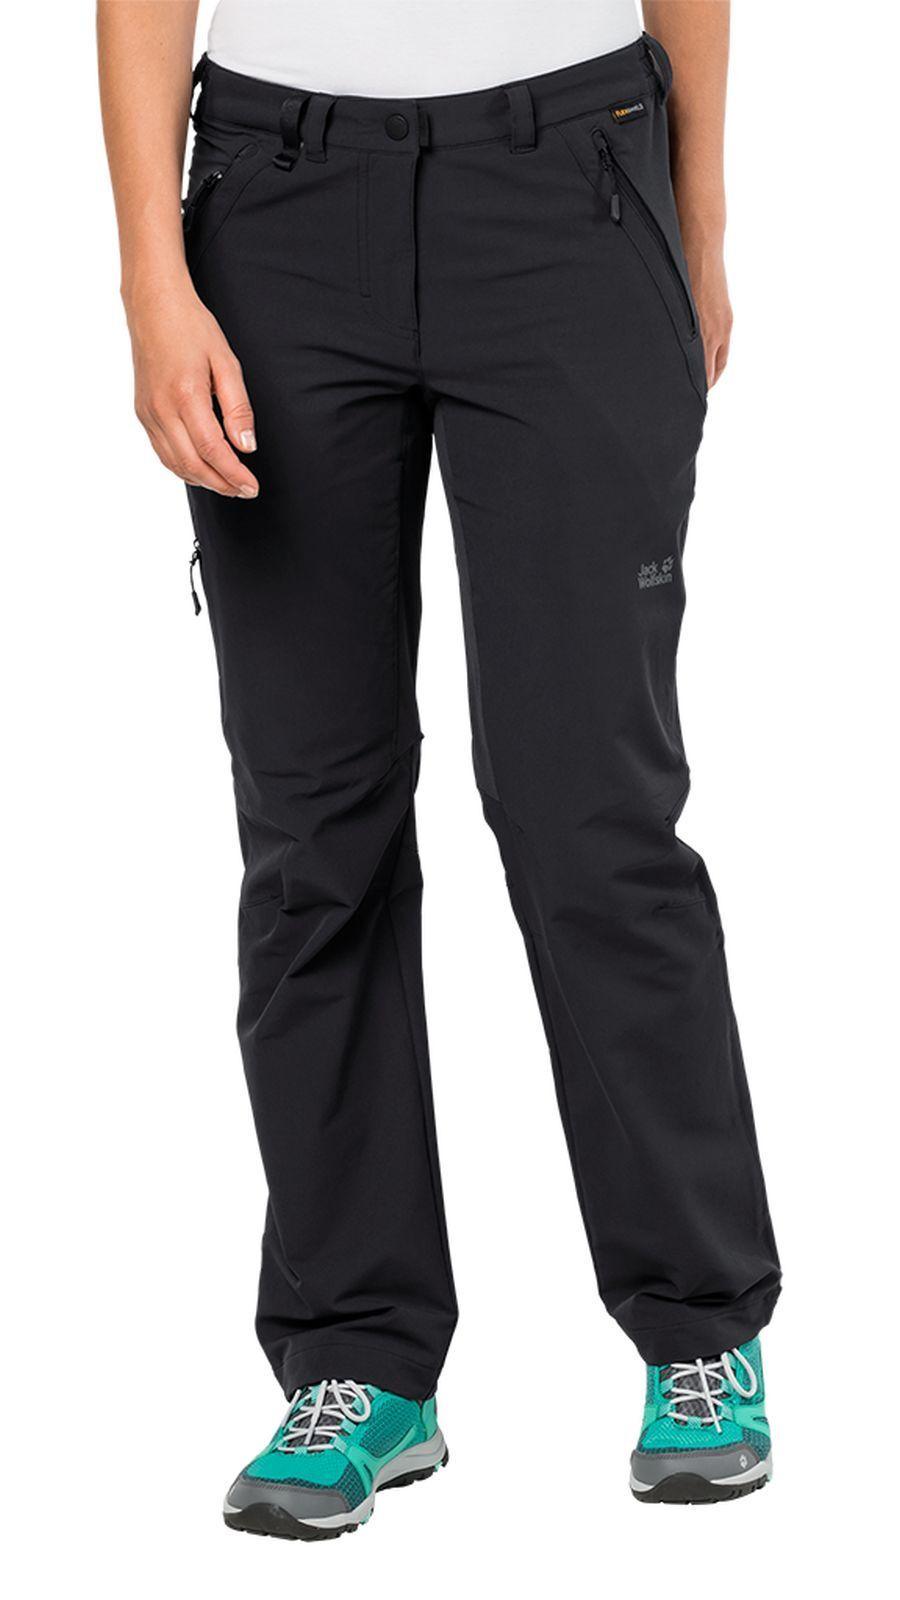 Jack Wolfskin señora senderismo outdoor-pantalones Activate XT Pants mujer negro